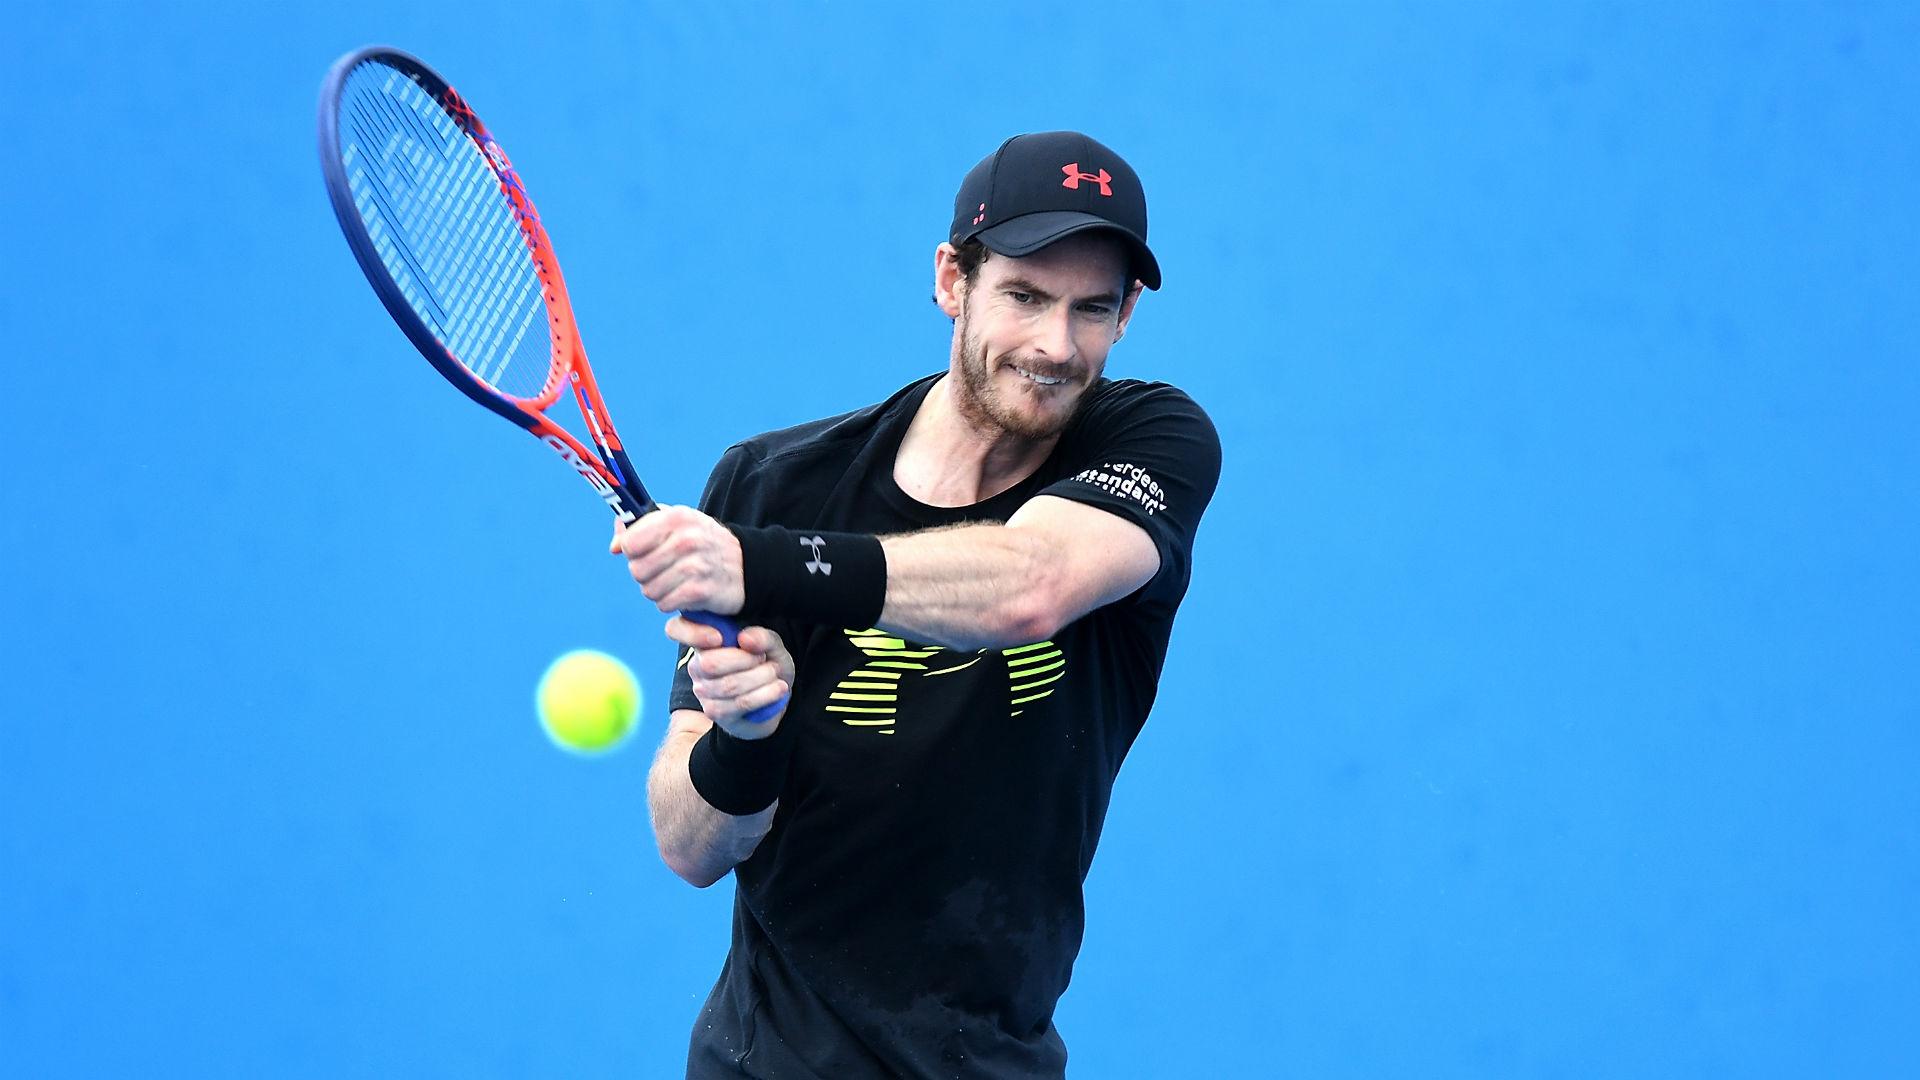 Andy Murray has hip surgery, plans return by Wimbledon